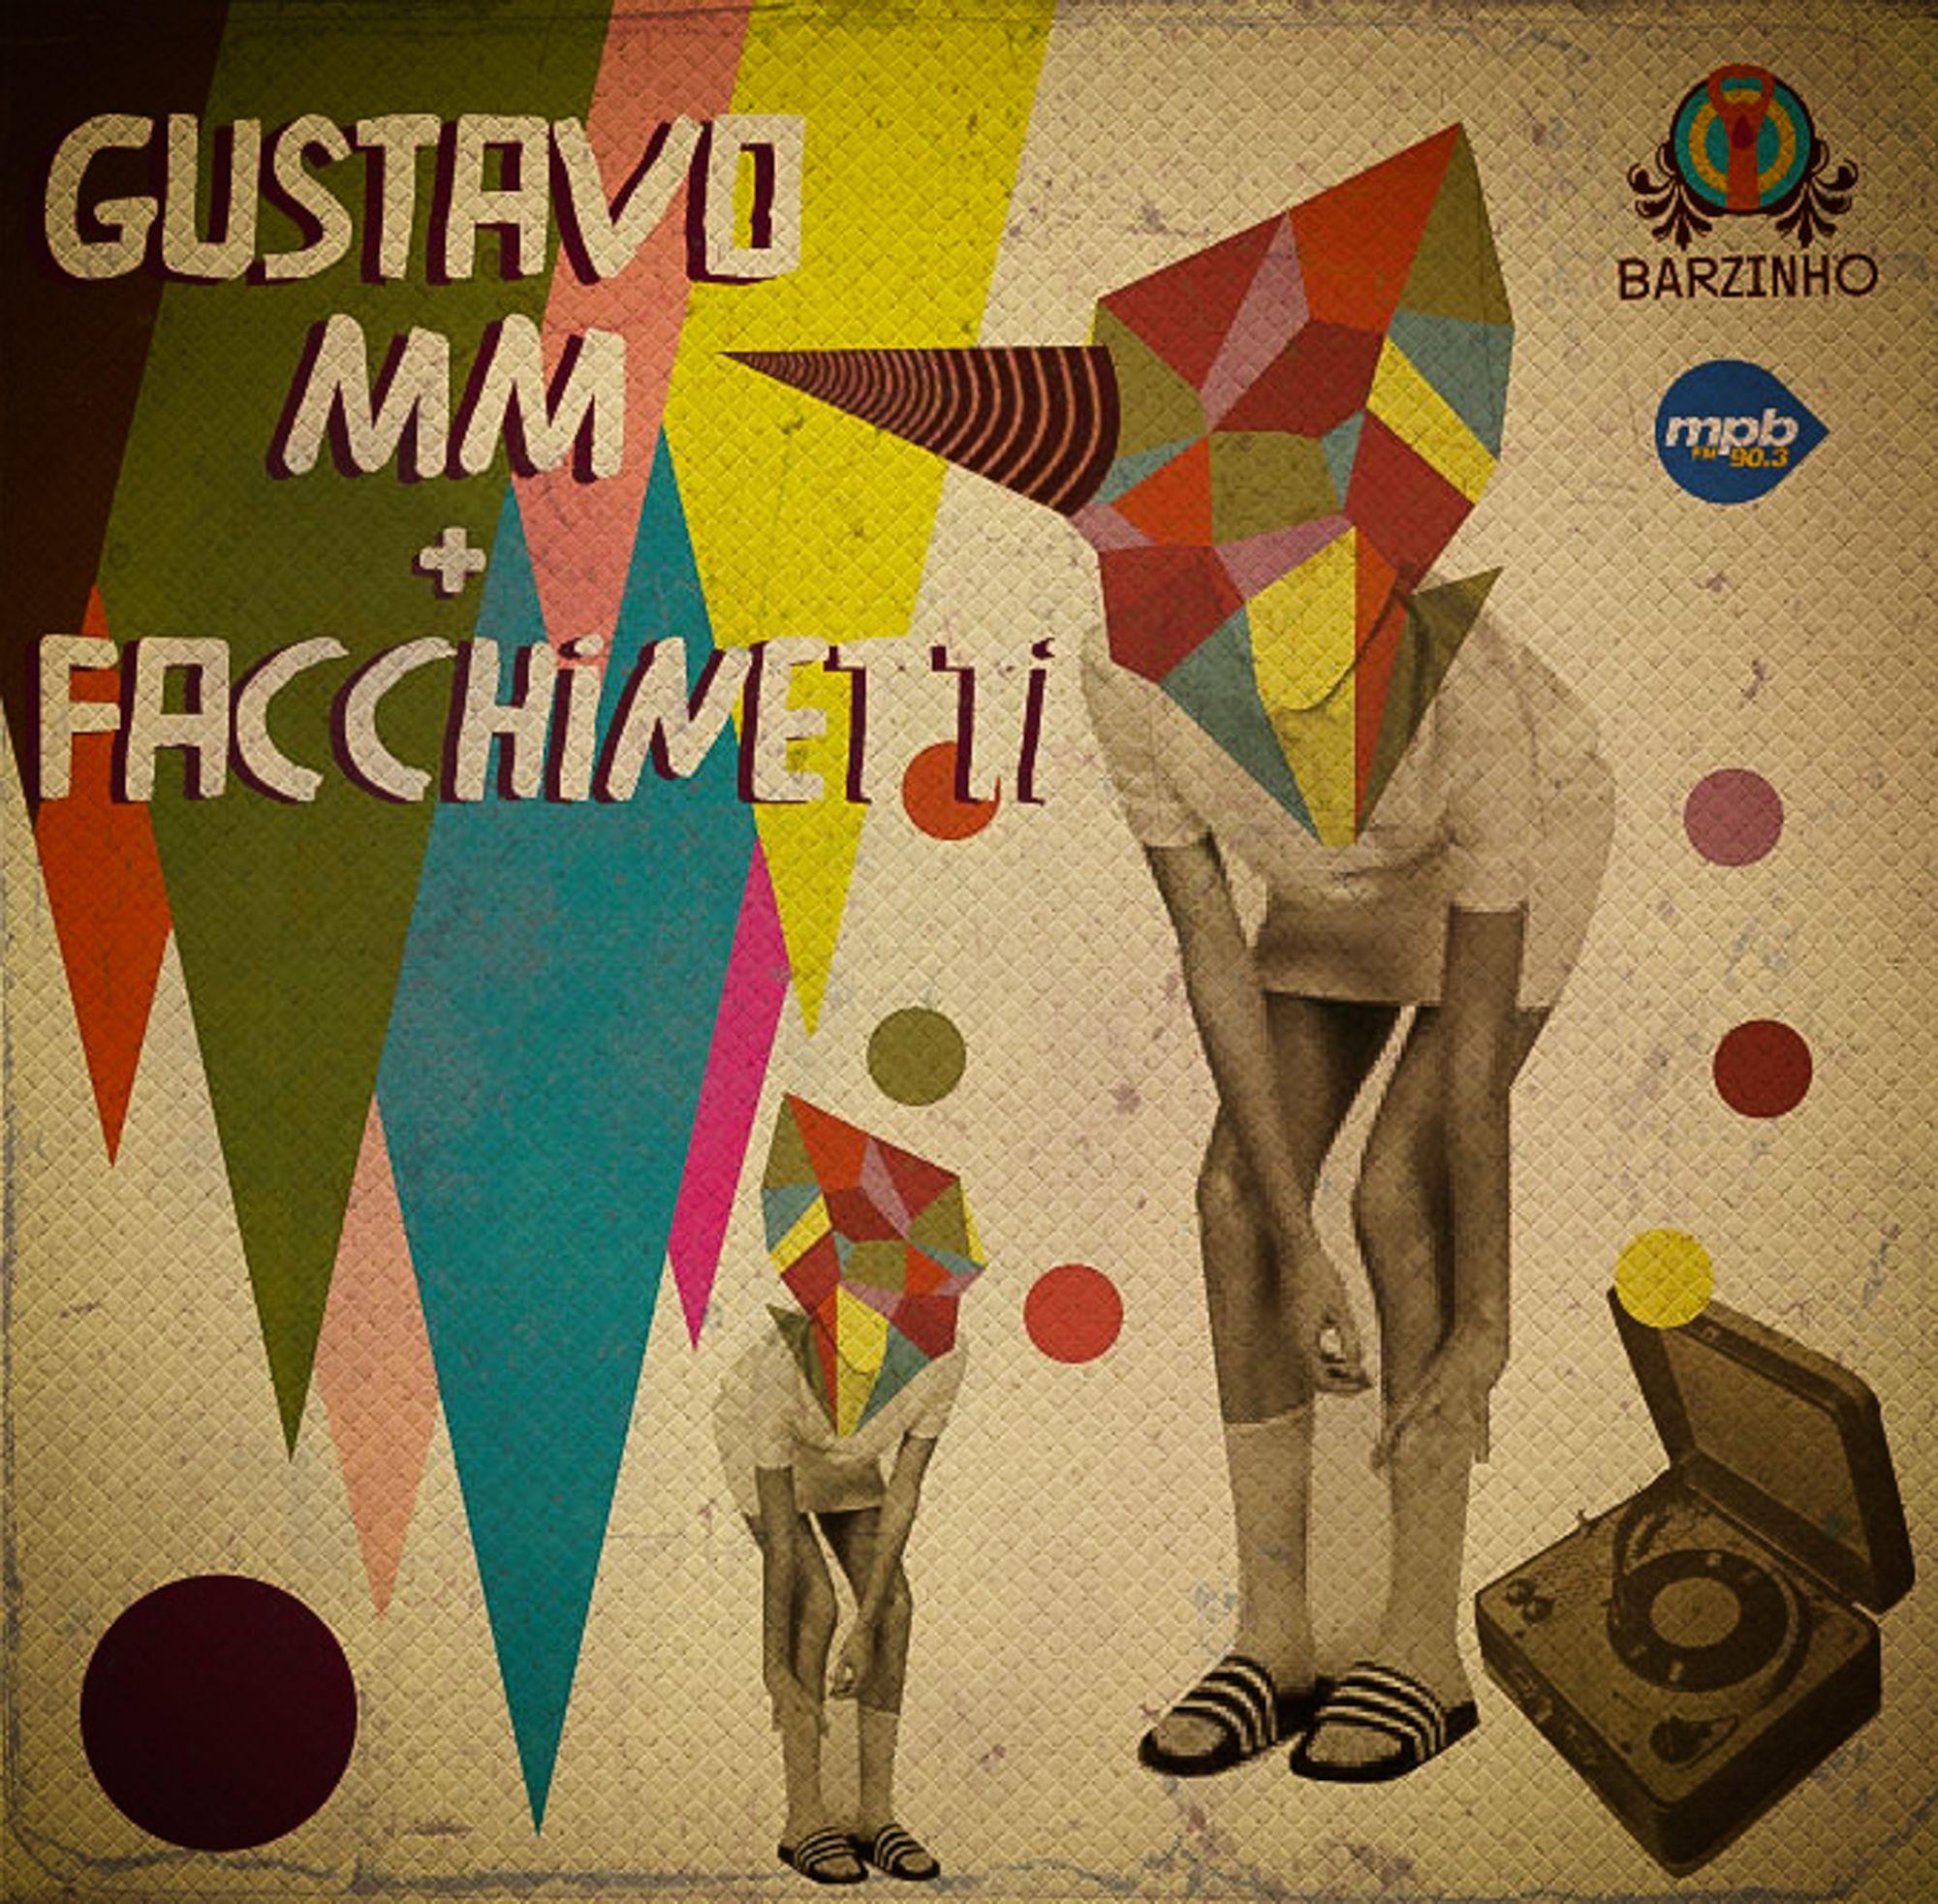 GUSTAVO MM & FACCHINETTI - BARZINHO